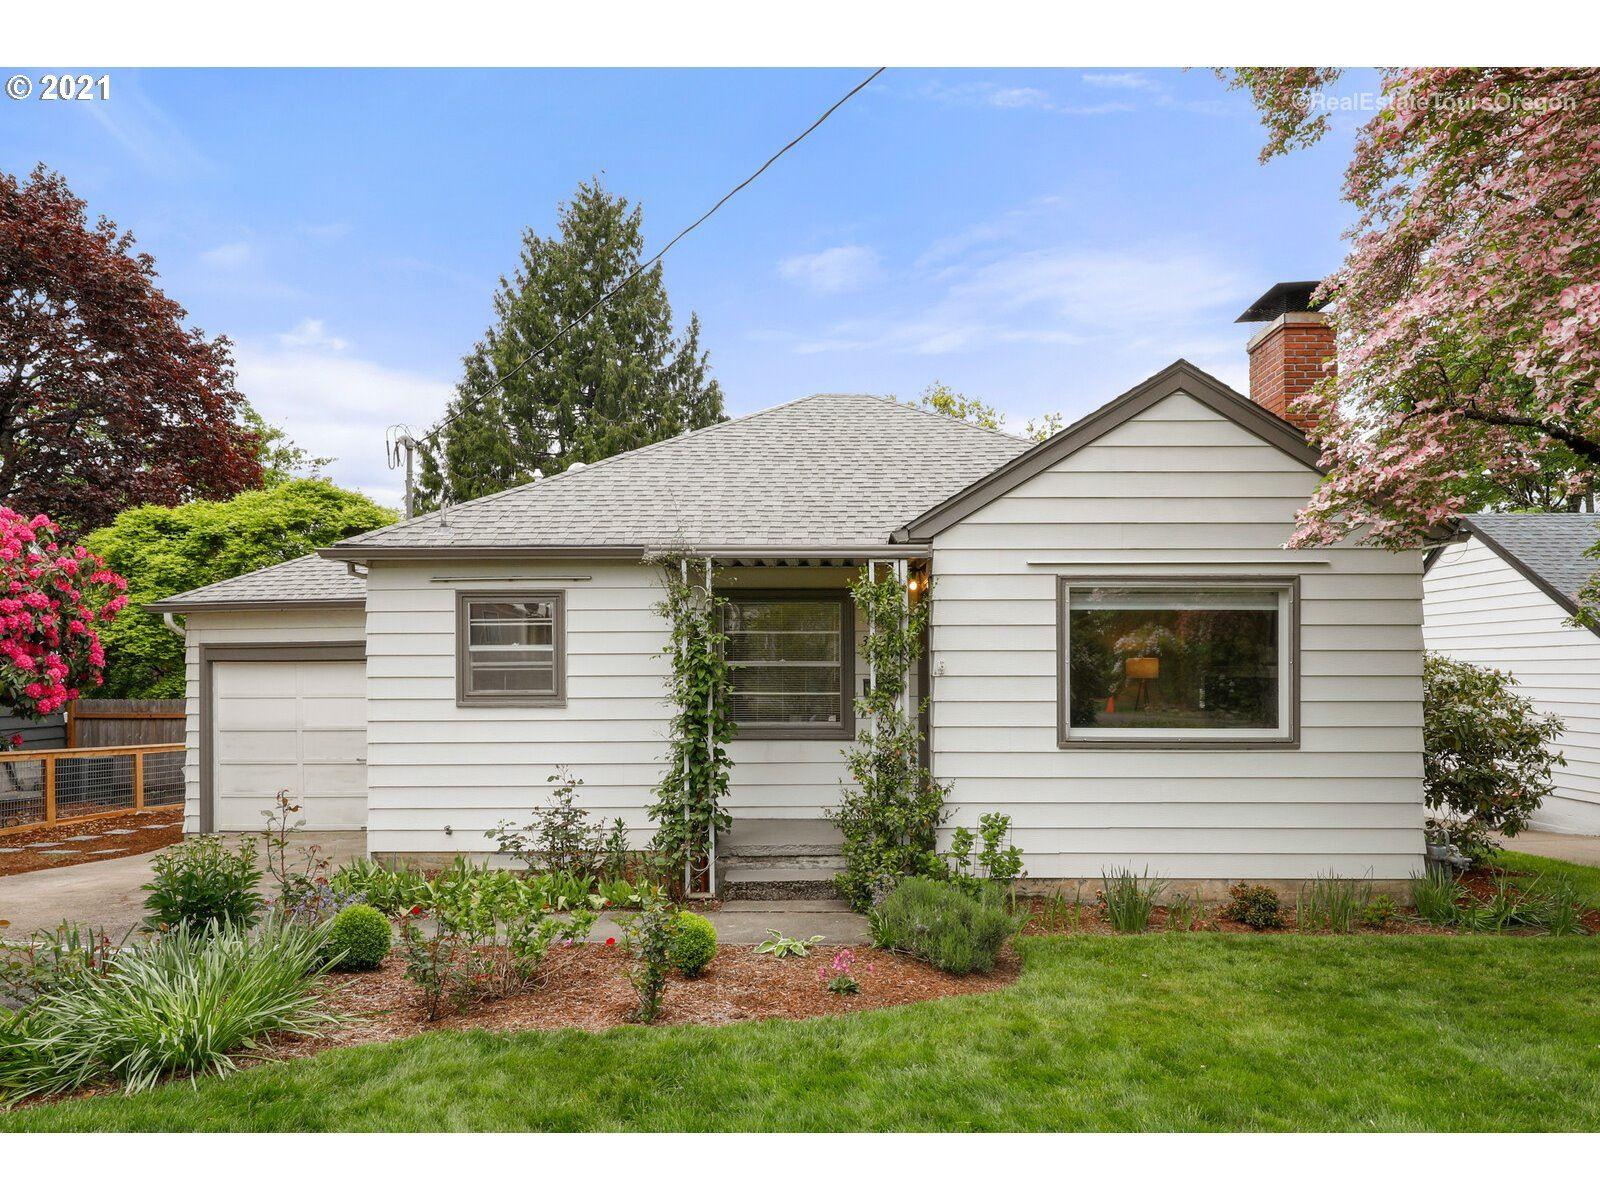 3221 SW PRIMROSE ST, Portland, OR 97219 - MLS#: 21583666